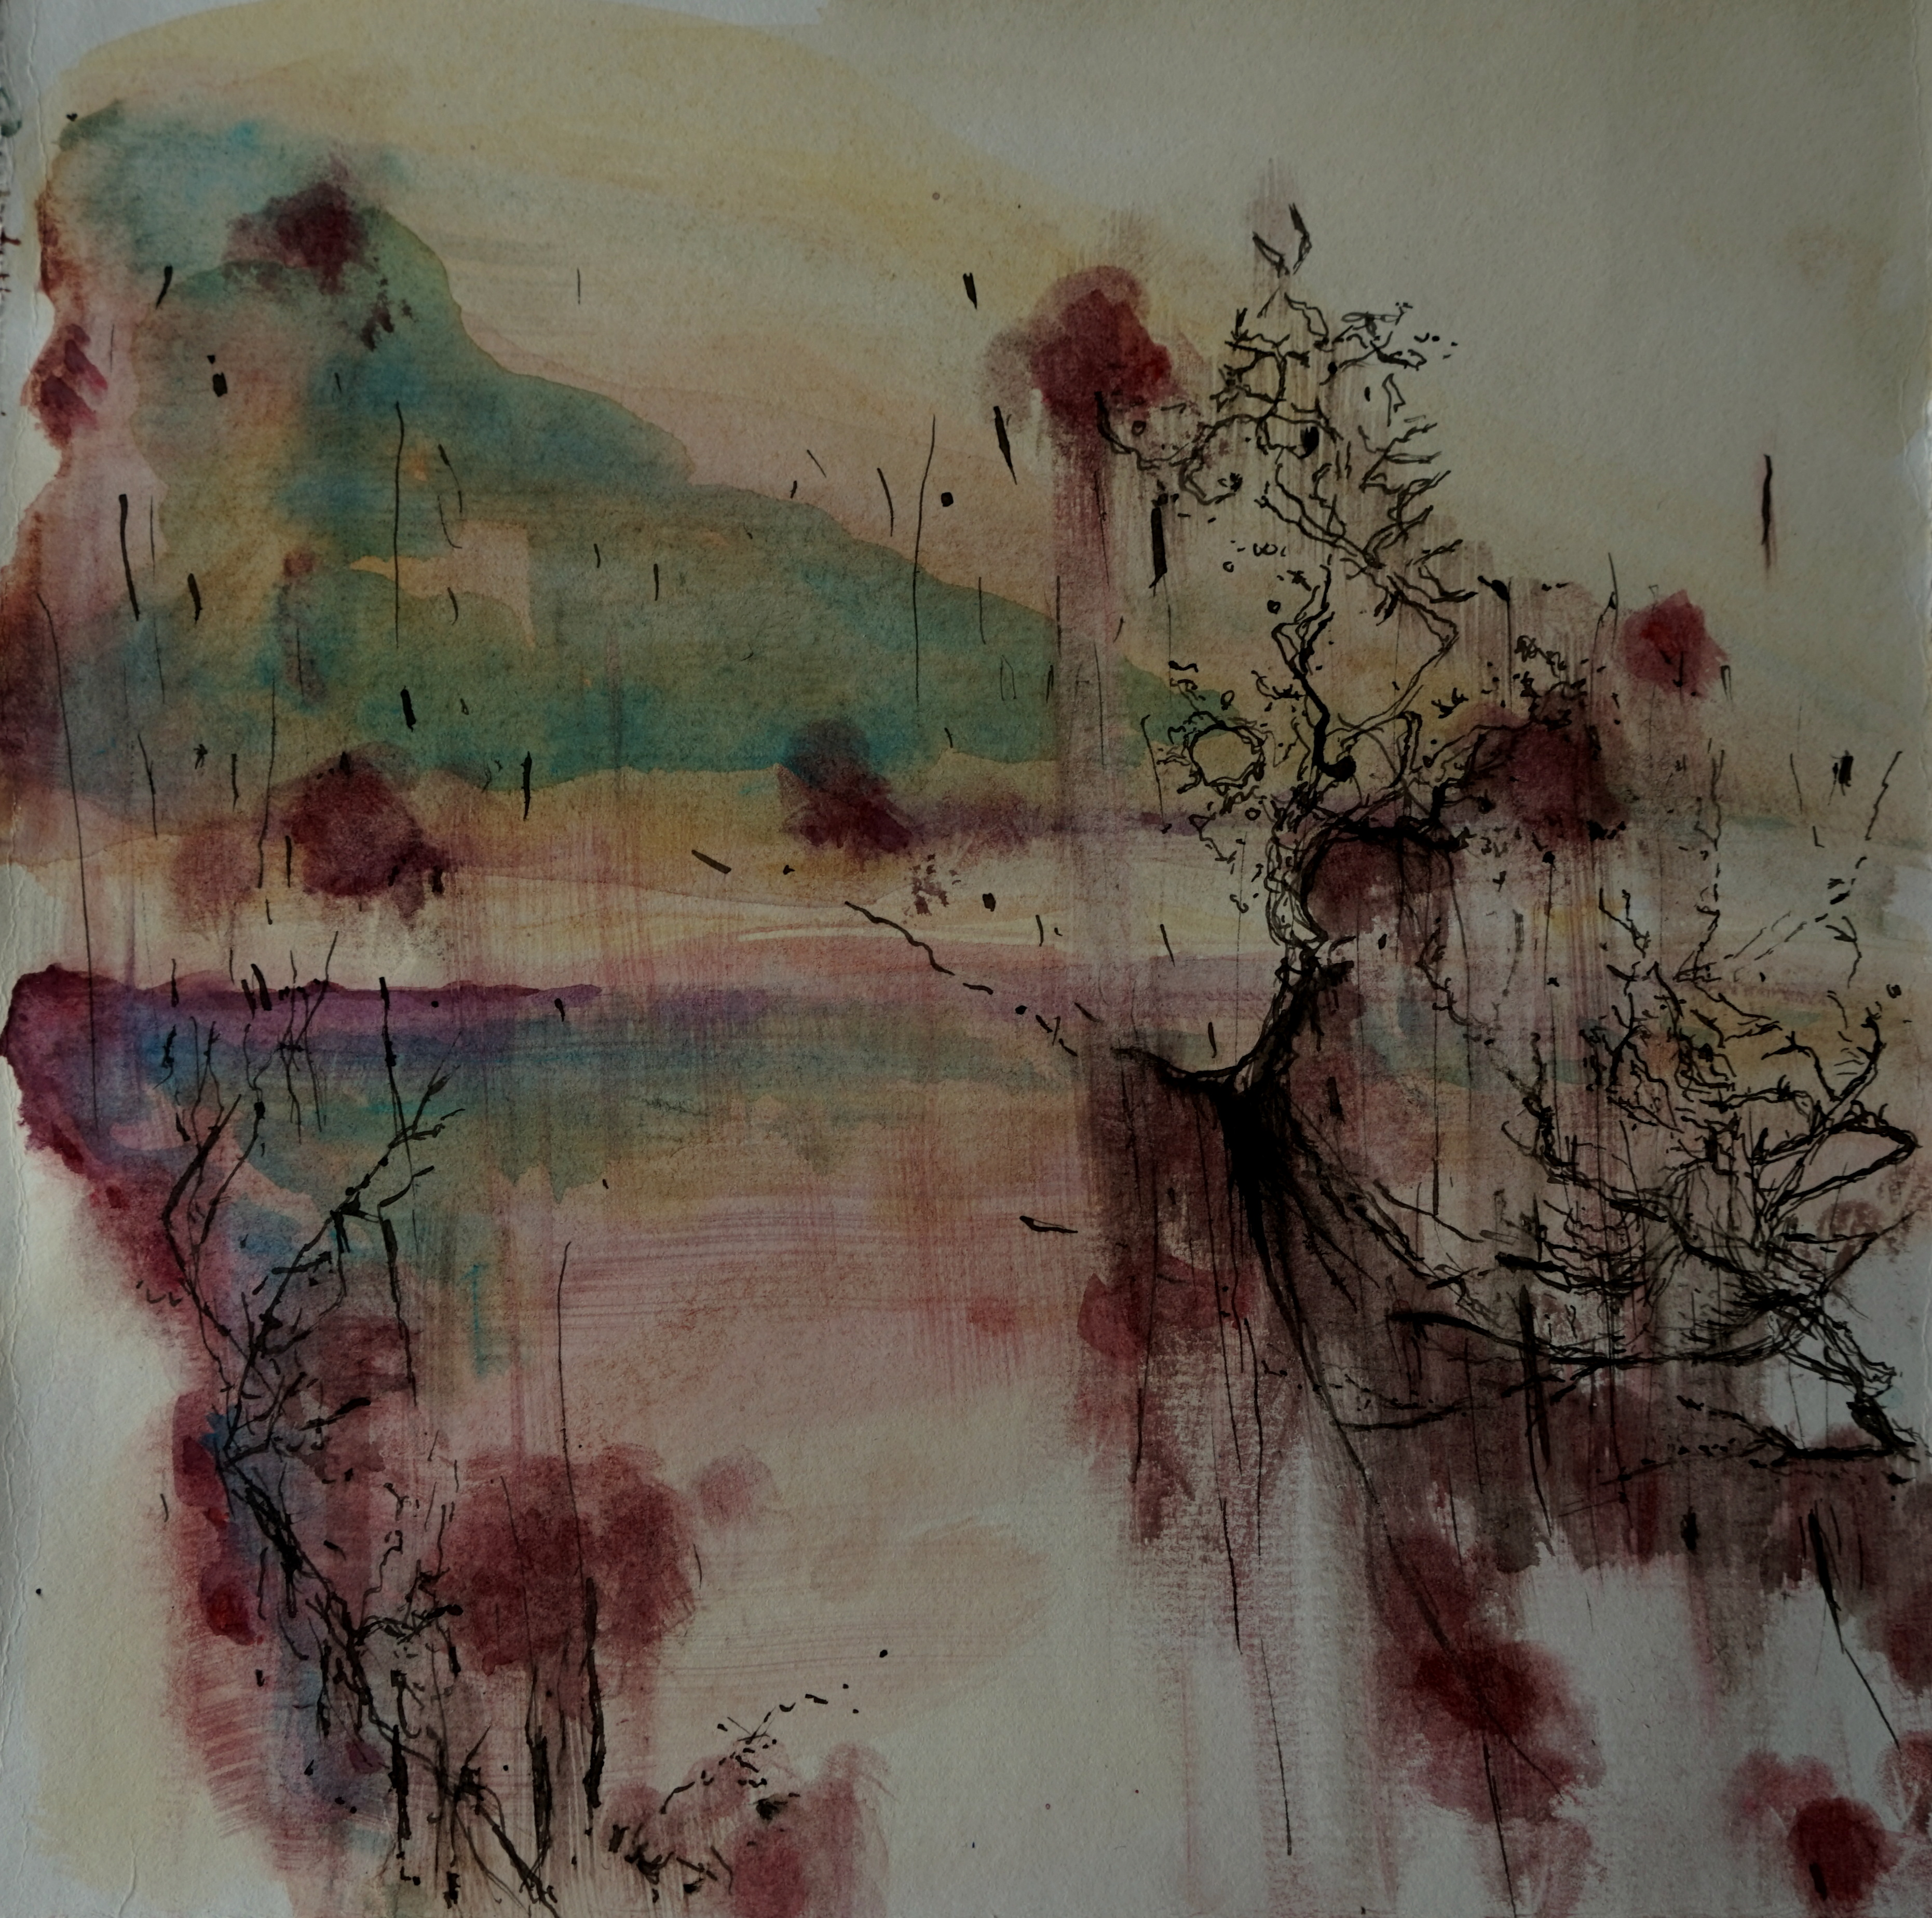 carita-savolainen-salt-rain-xi-watercolor-and-ink-on-paper-25cm-x-25cm-2020